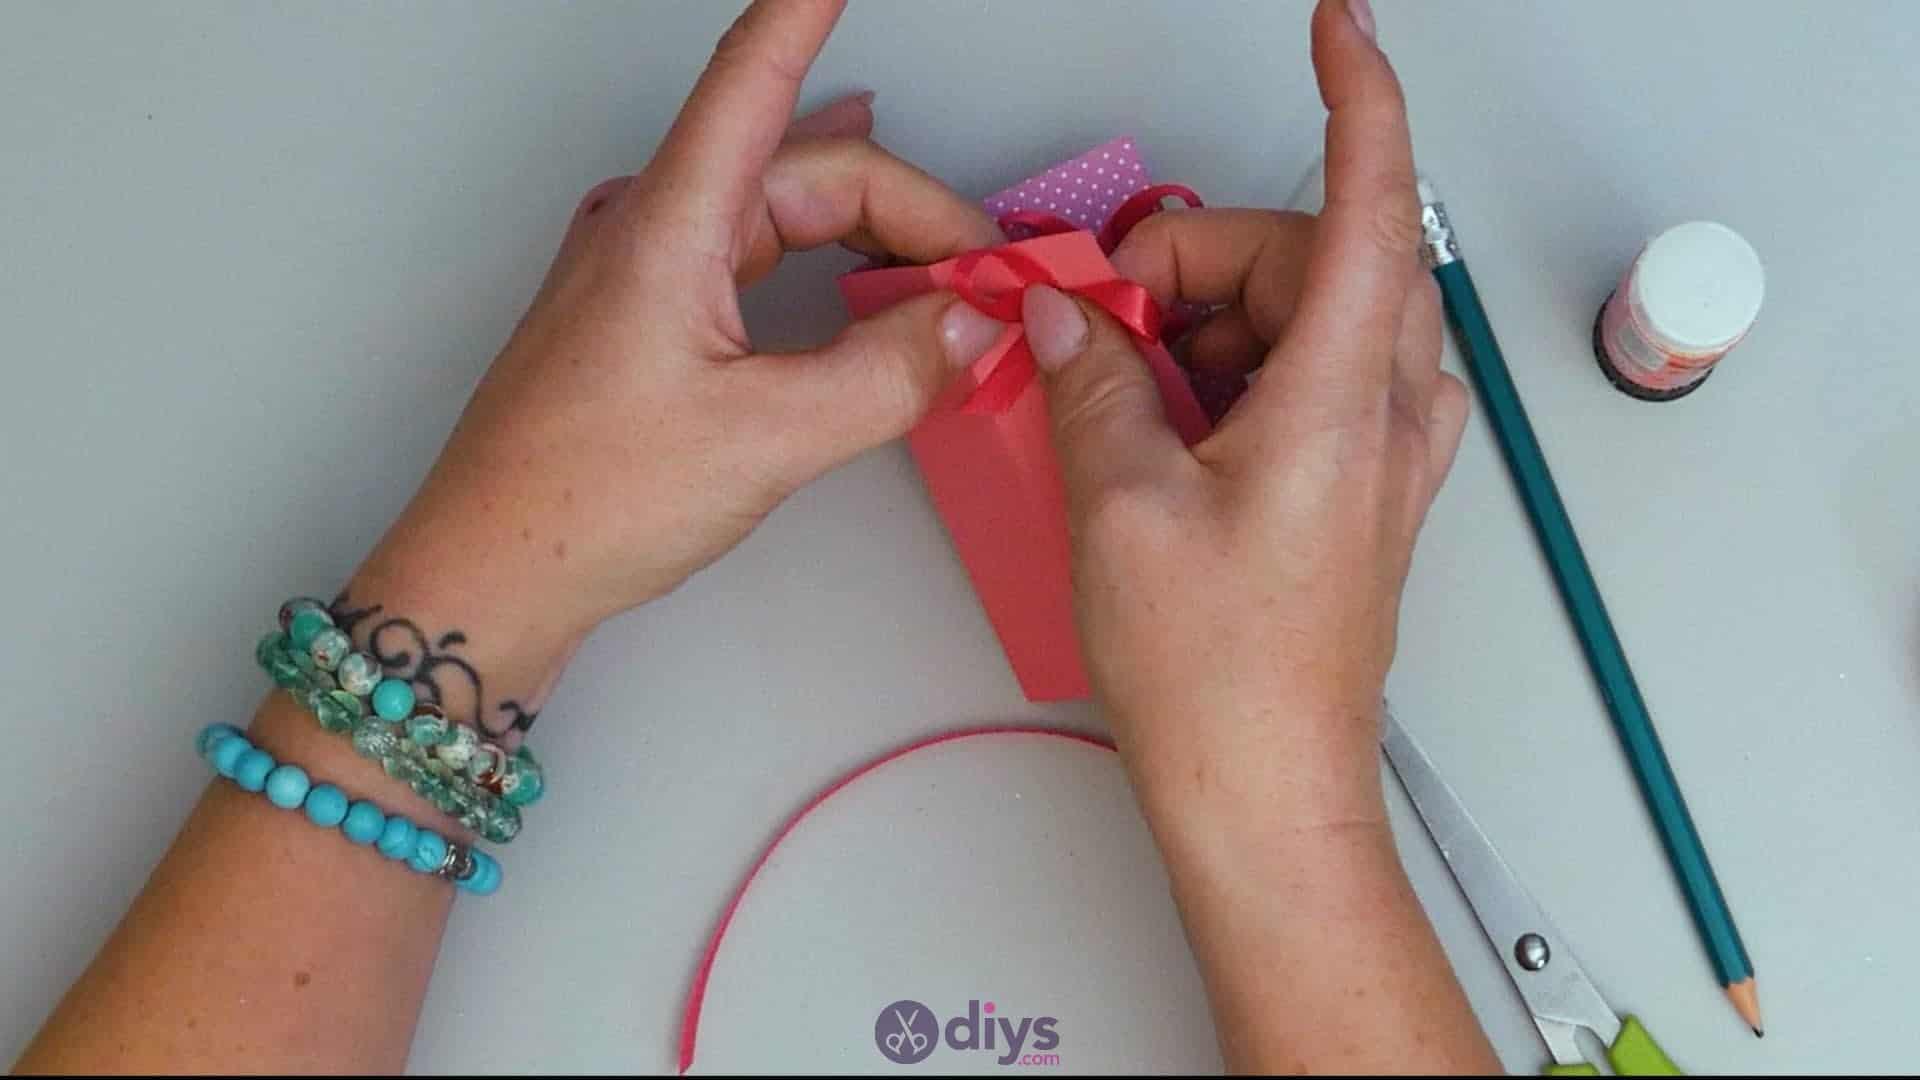 Diy lipstick gift card step 10a